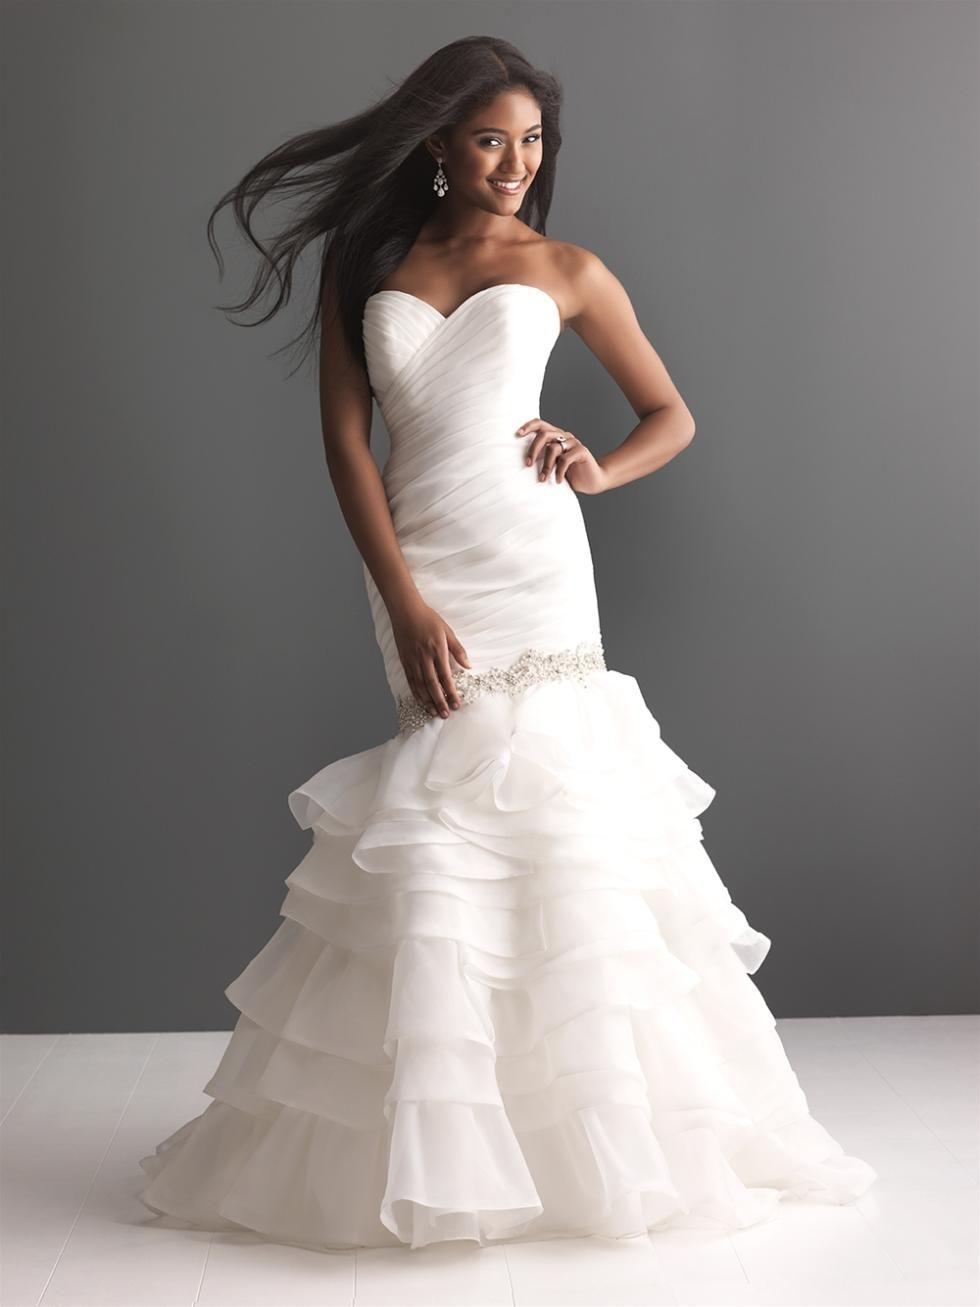 big puffy wedding dresses Puffy wedding dresses